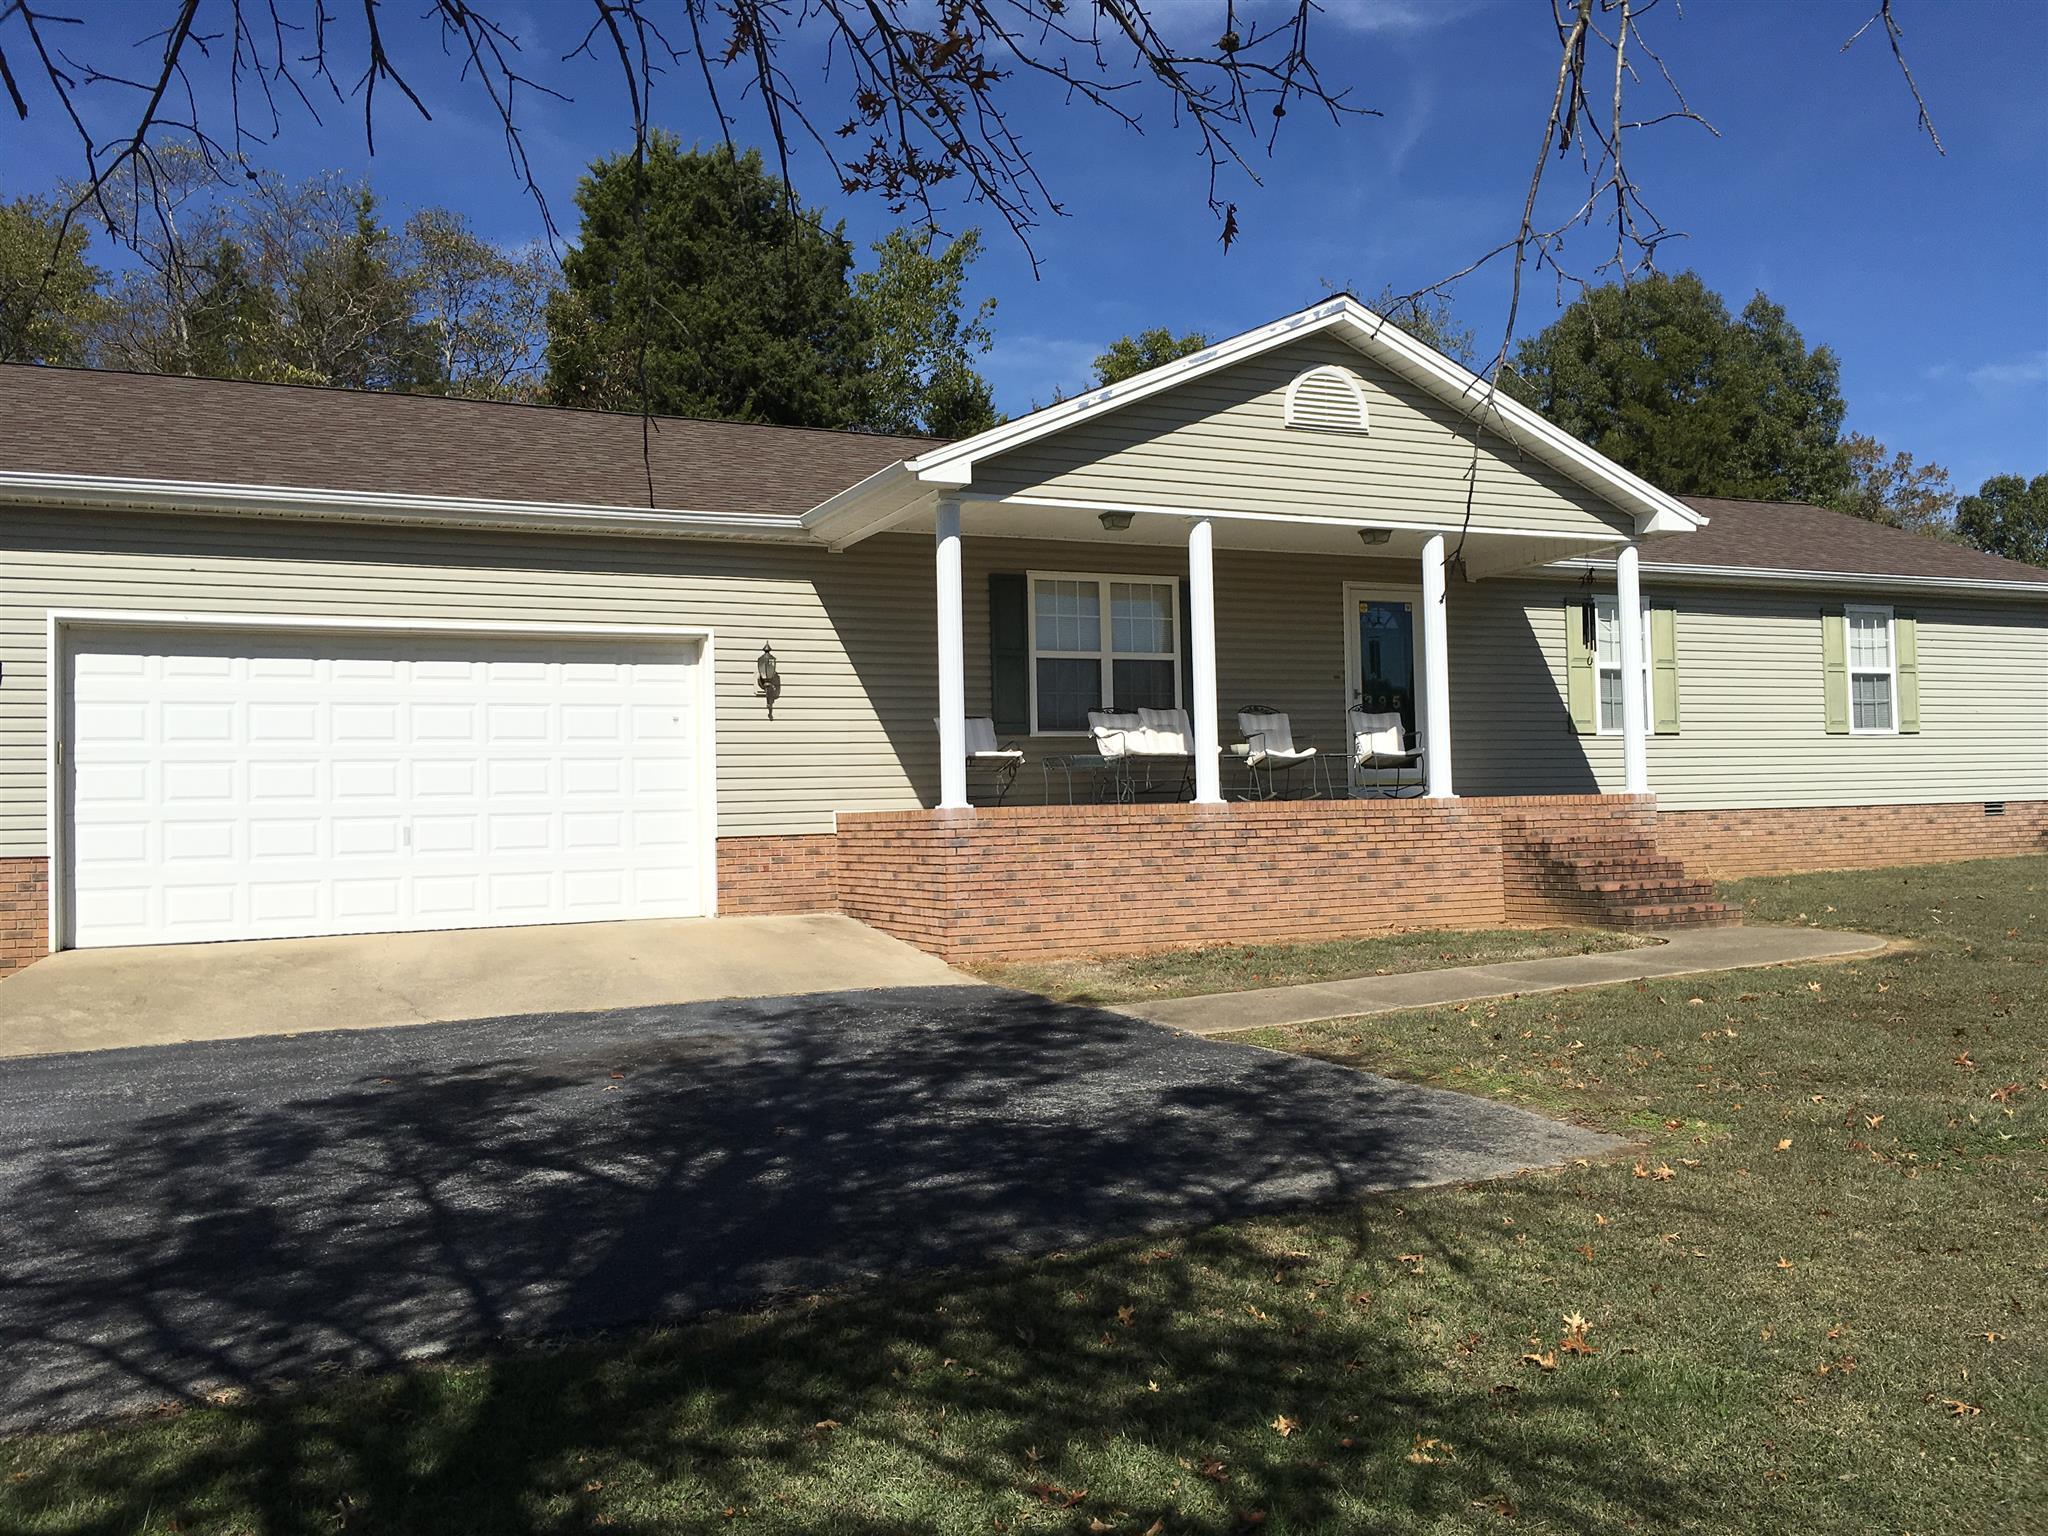 395 Grand Orchard Dr, Hopkinsville, KY 42240 - Hopkinsville, KY real estate listing